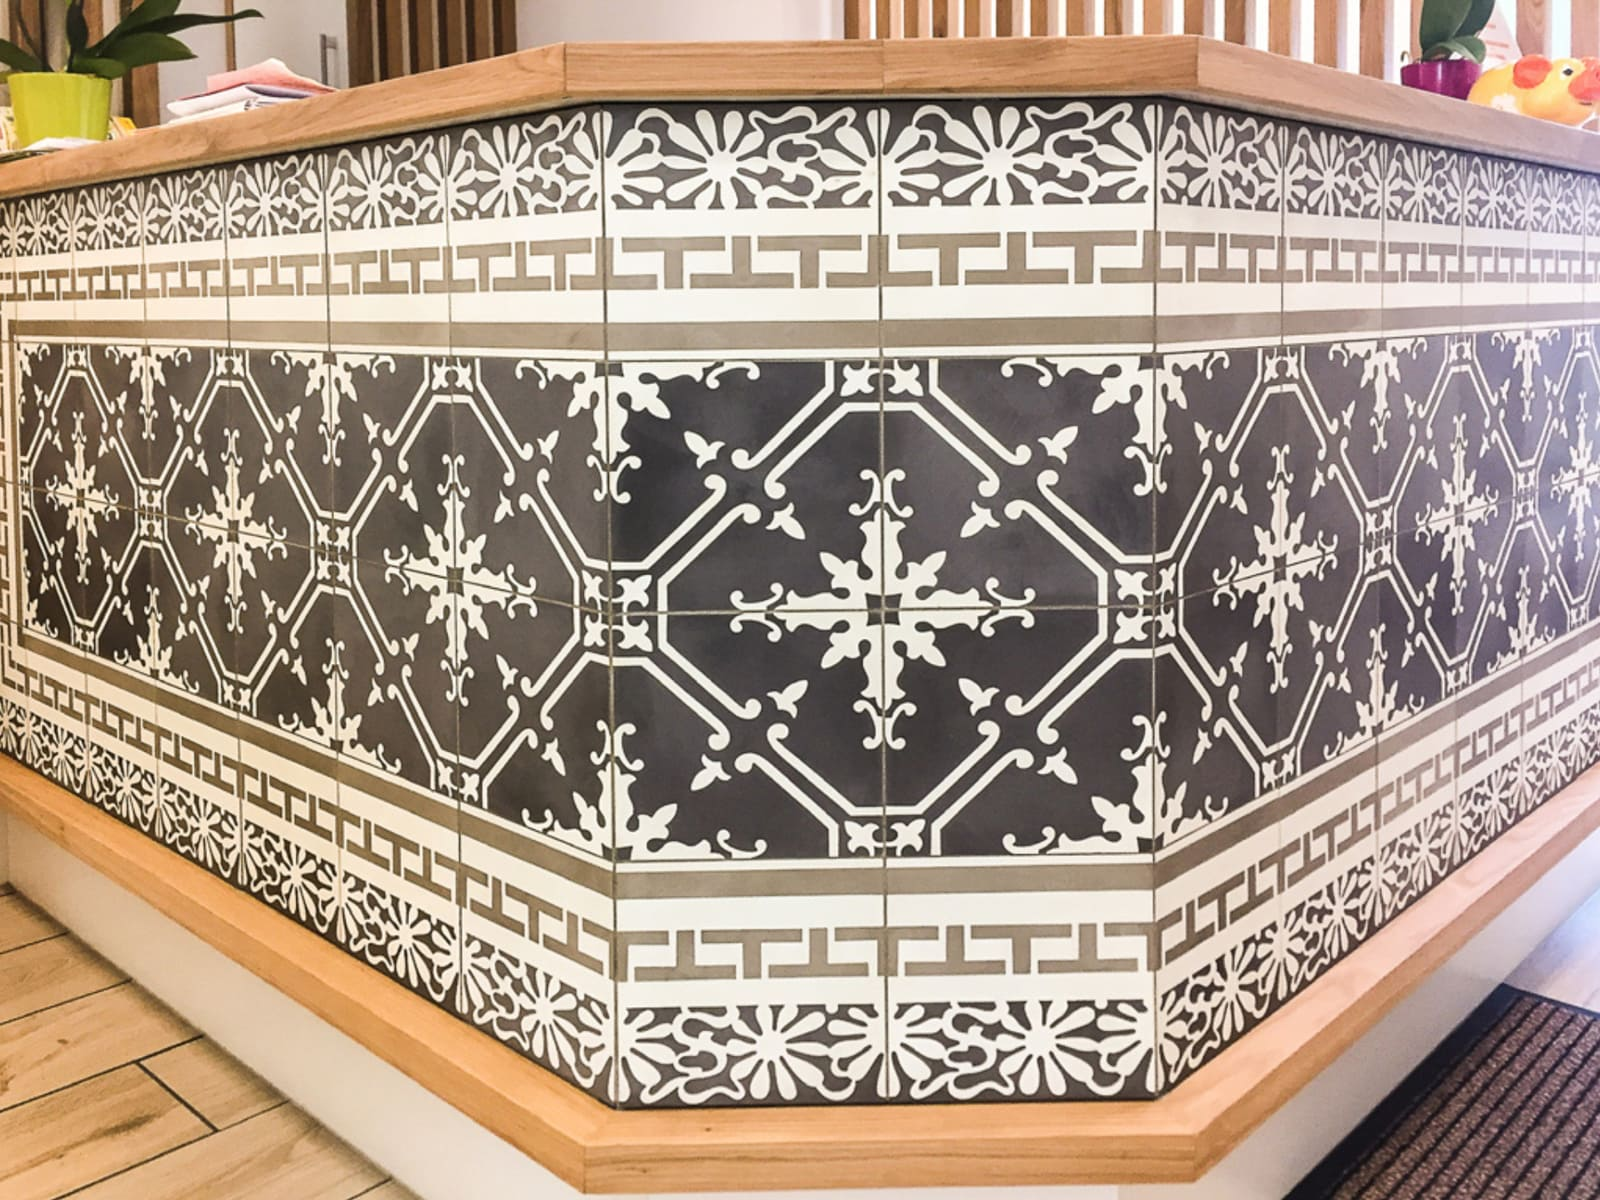 zementfliesen-VIA-zementmosaikplatten-nummer-11561-tresen Kopie | 11561